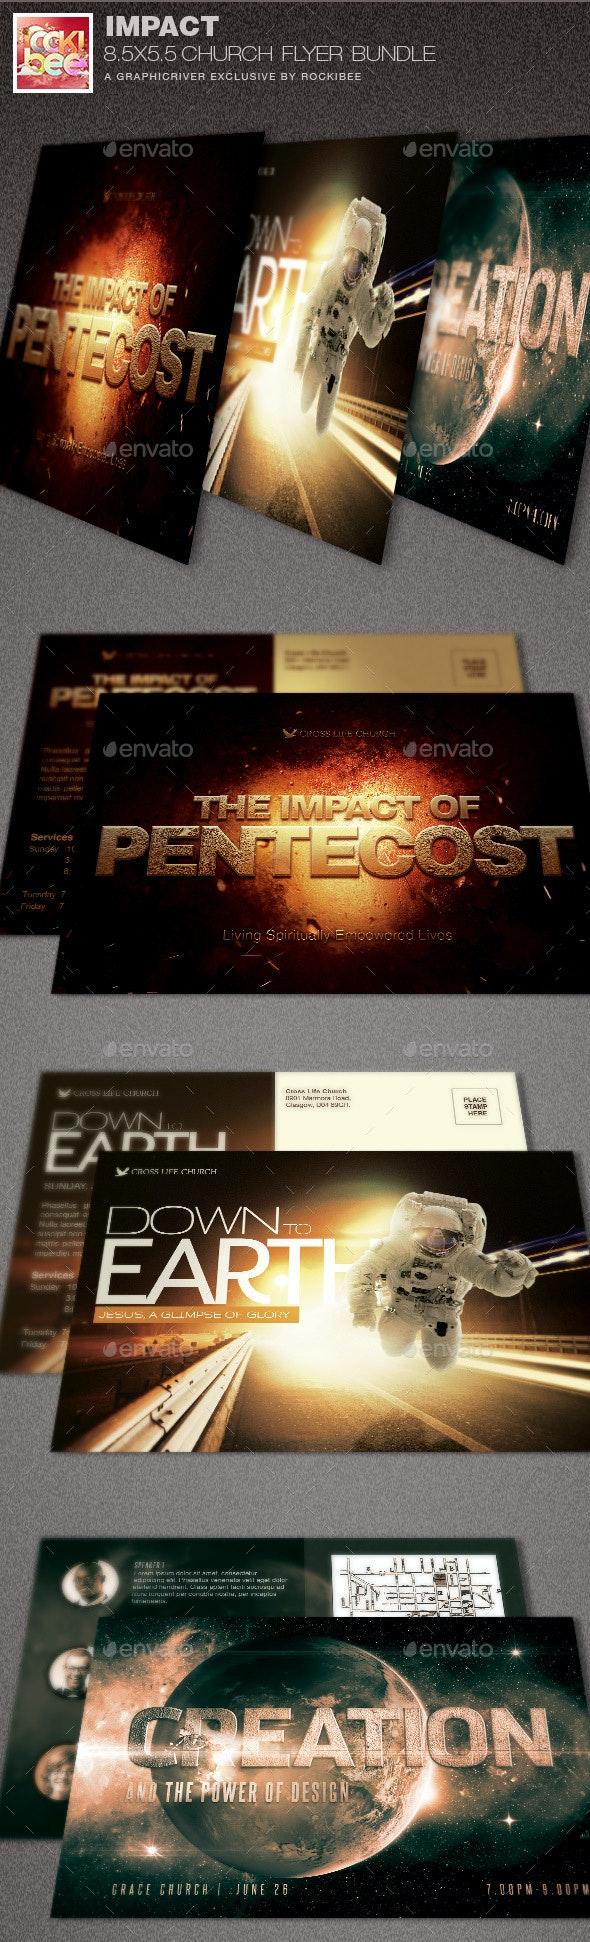 Impact Church Flyer Template Bundle - Church Flyers